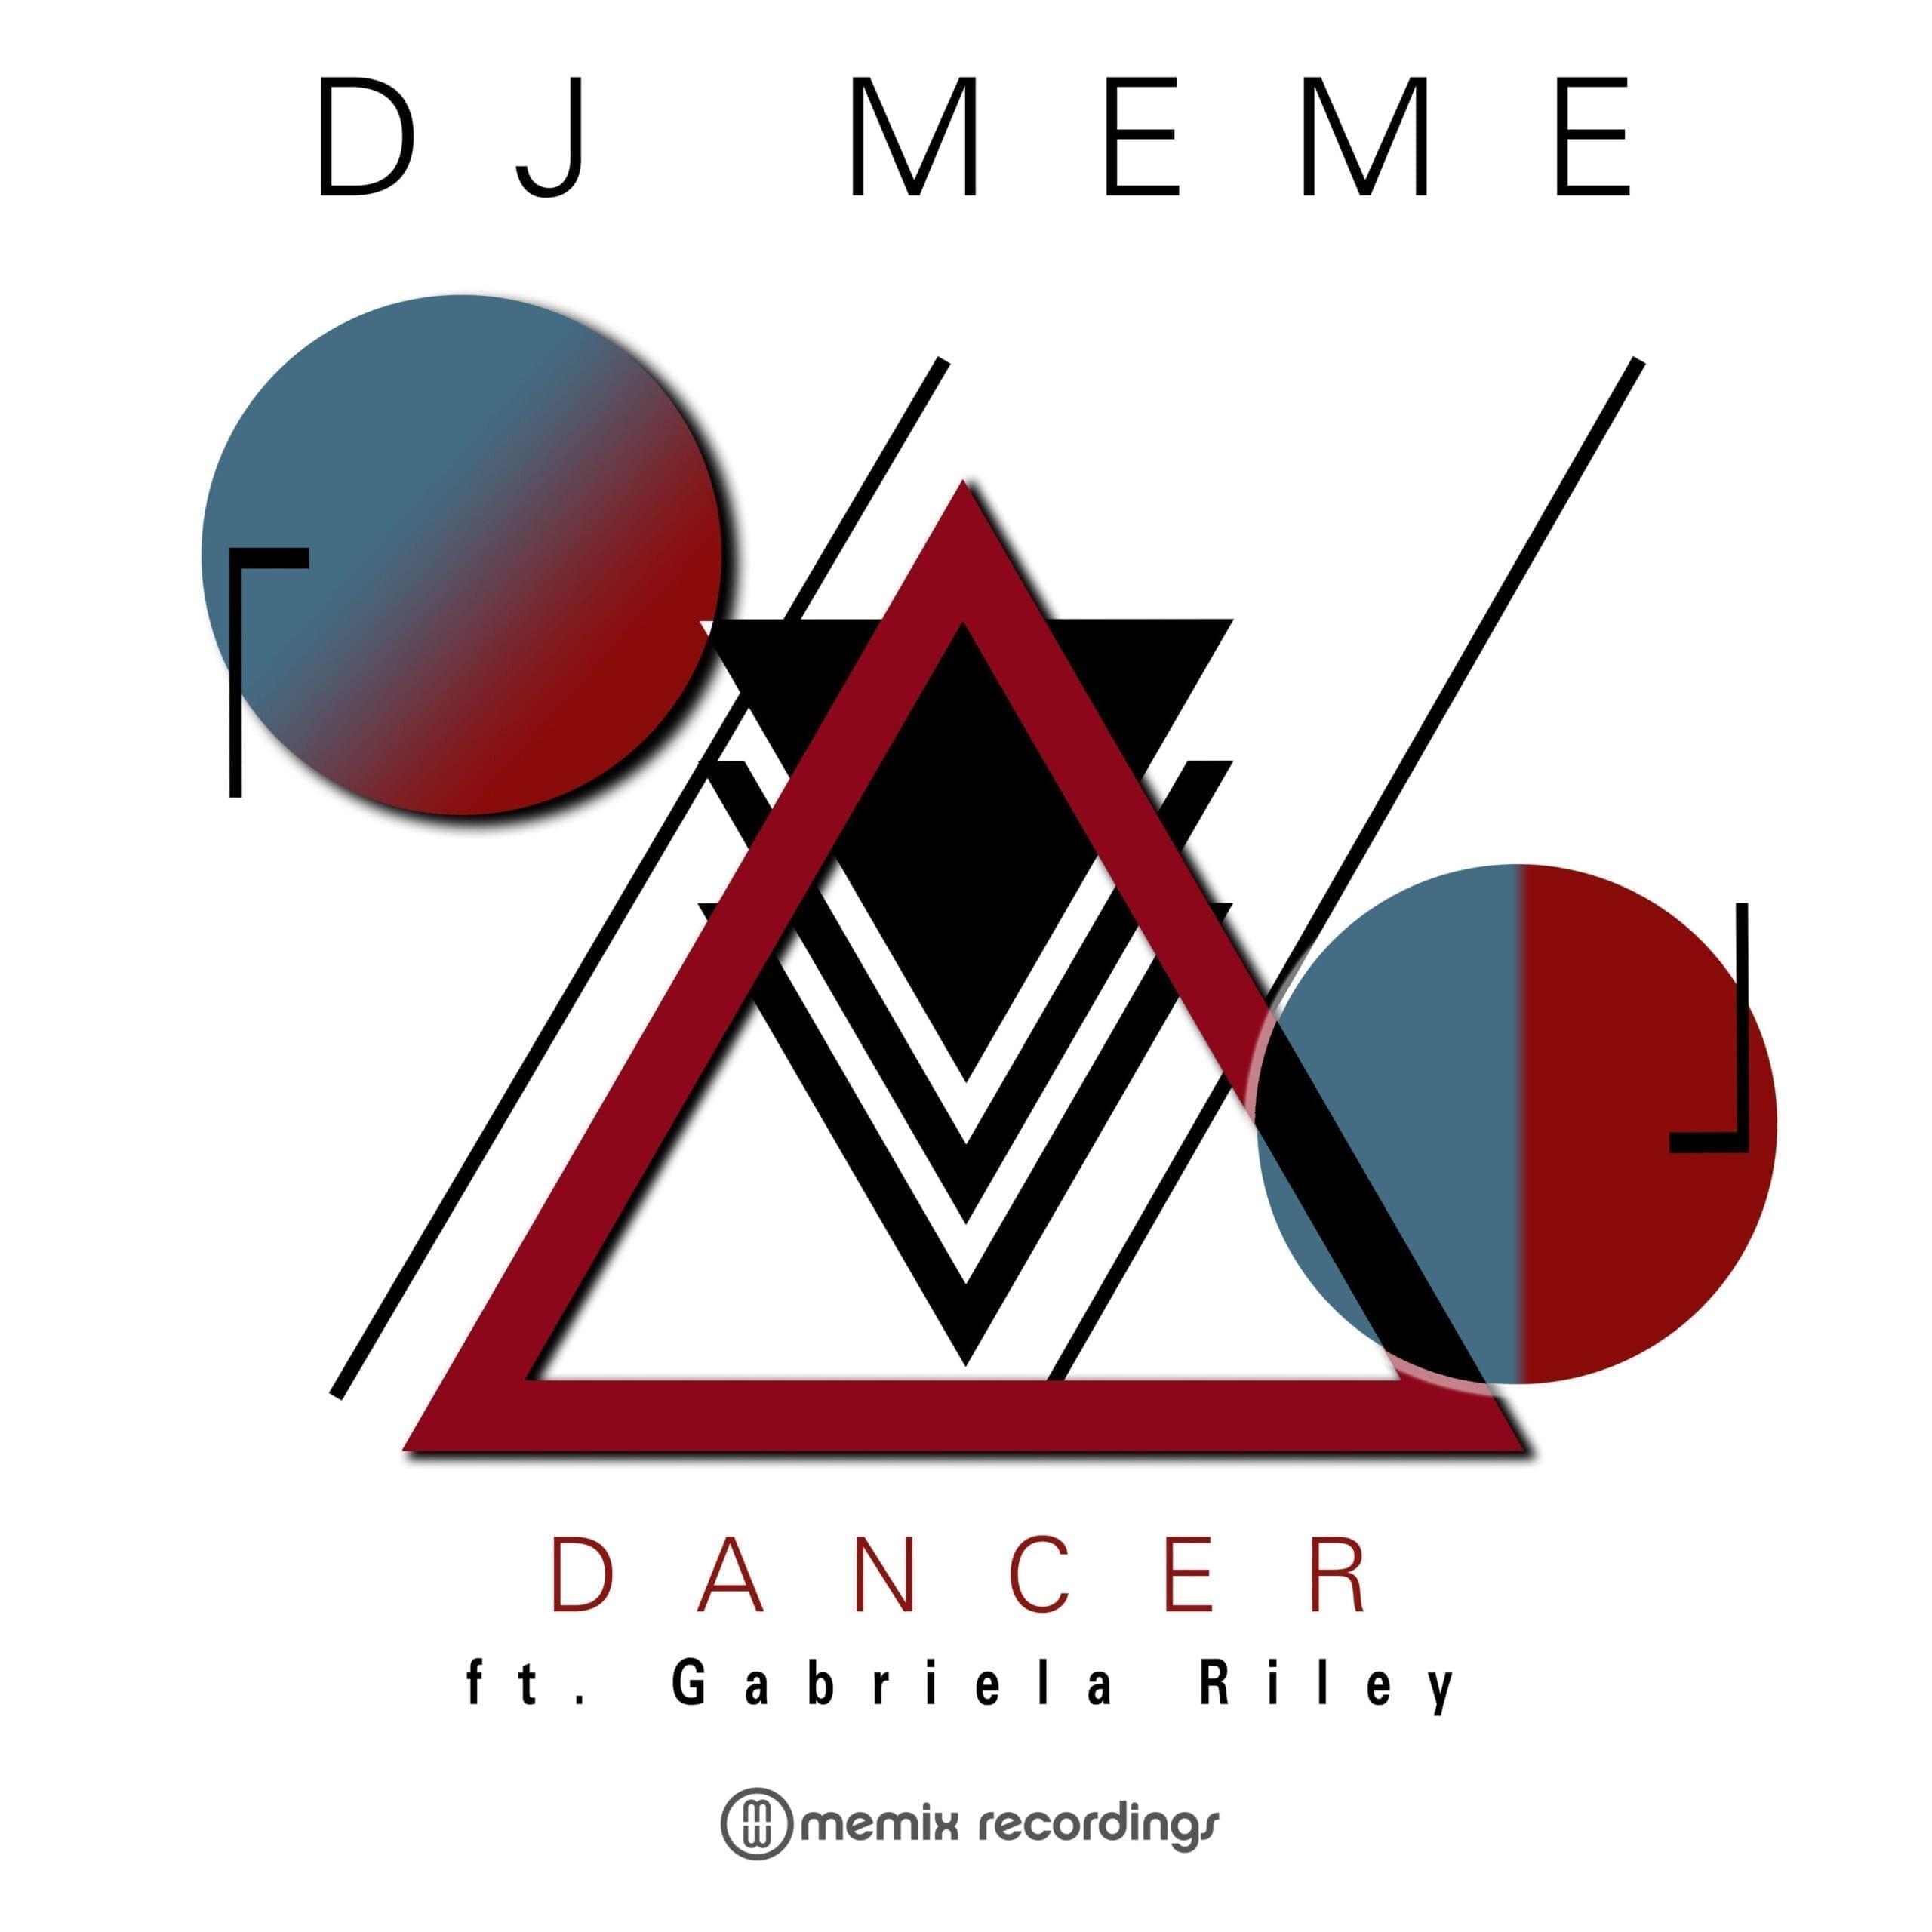 DJ Meme 'Dancer' Ft. Gabriela Riley Memix Recordings